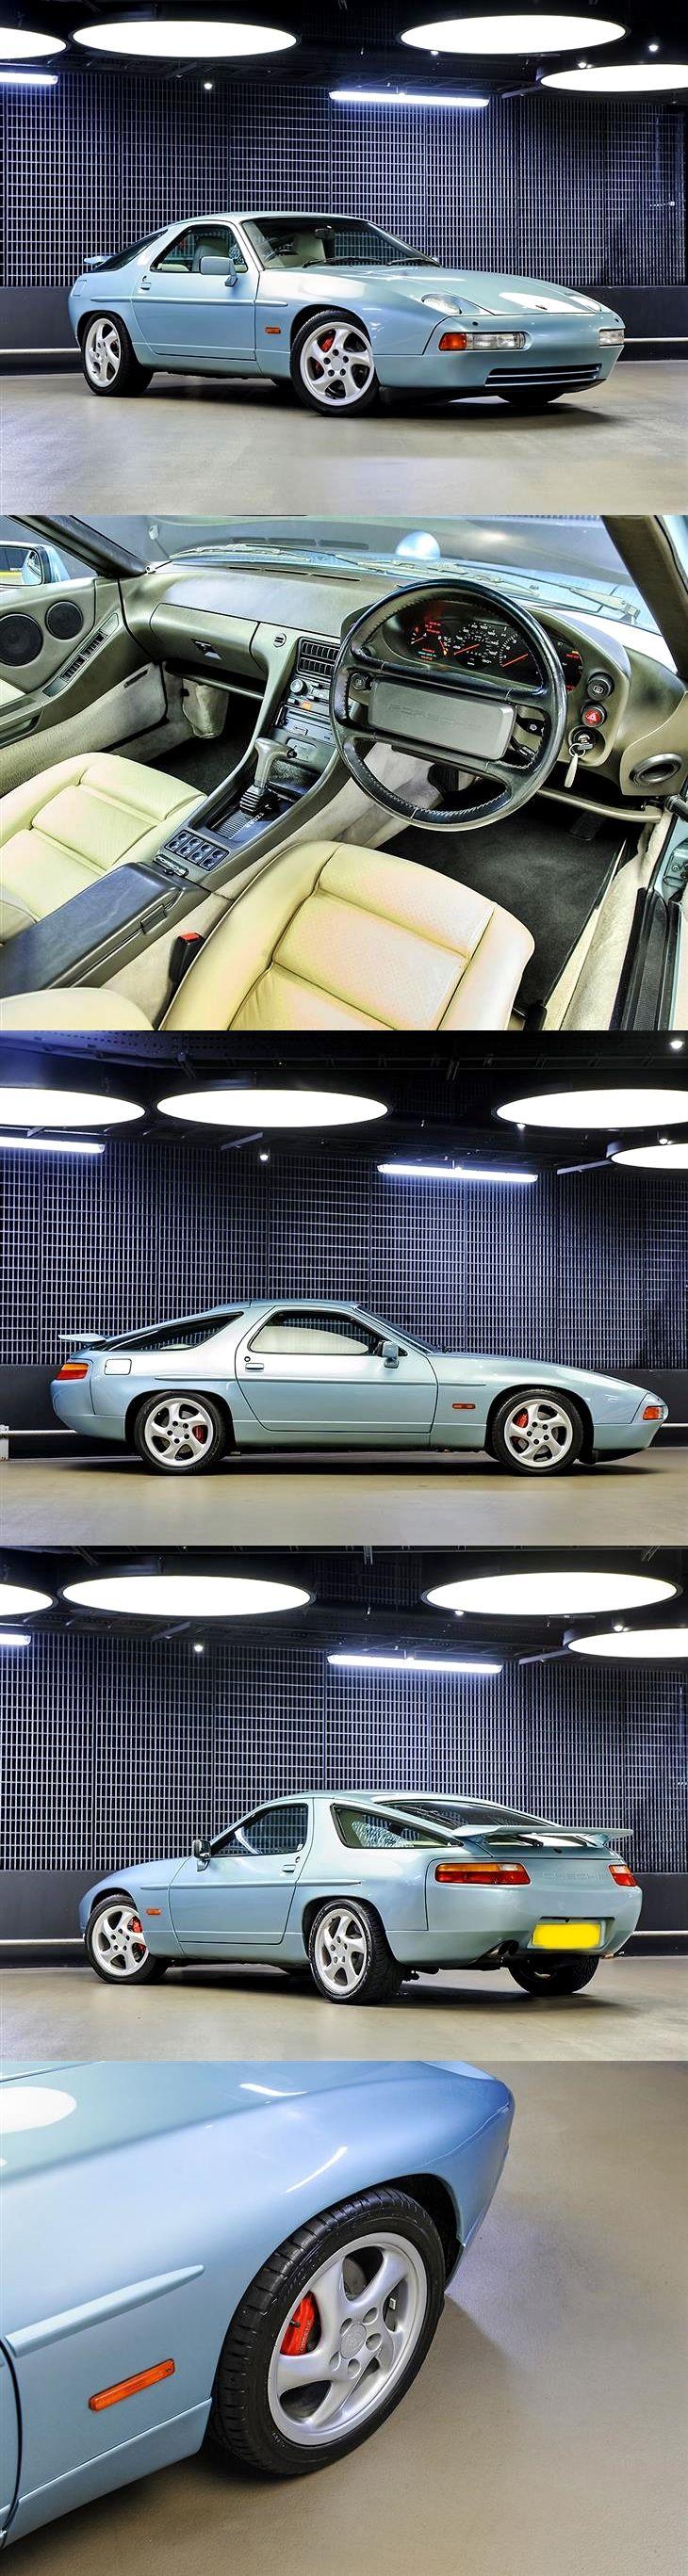 1988 Porsche 928 S4 Auto 2dr Coupe https://www.amazon.co.uk/Baby-Car-Mirror-Shatterproof-Installation/dp/B06XHG6SSY/ref=sr_1_2?ie=UTF8&qid=1499074433&sr=8-2&keywords=Kingseye